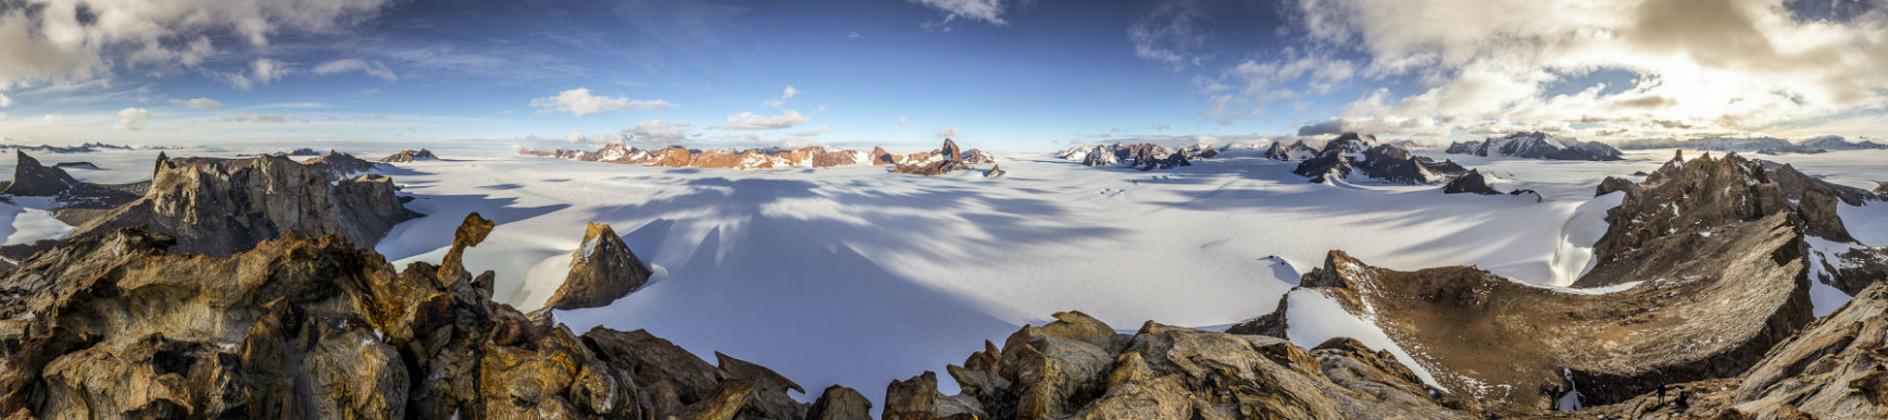 Cory-Richards-Photographer-Antarctica-24.jpg